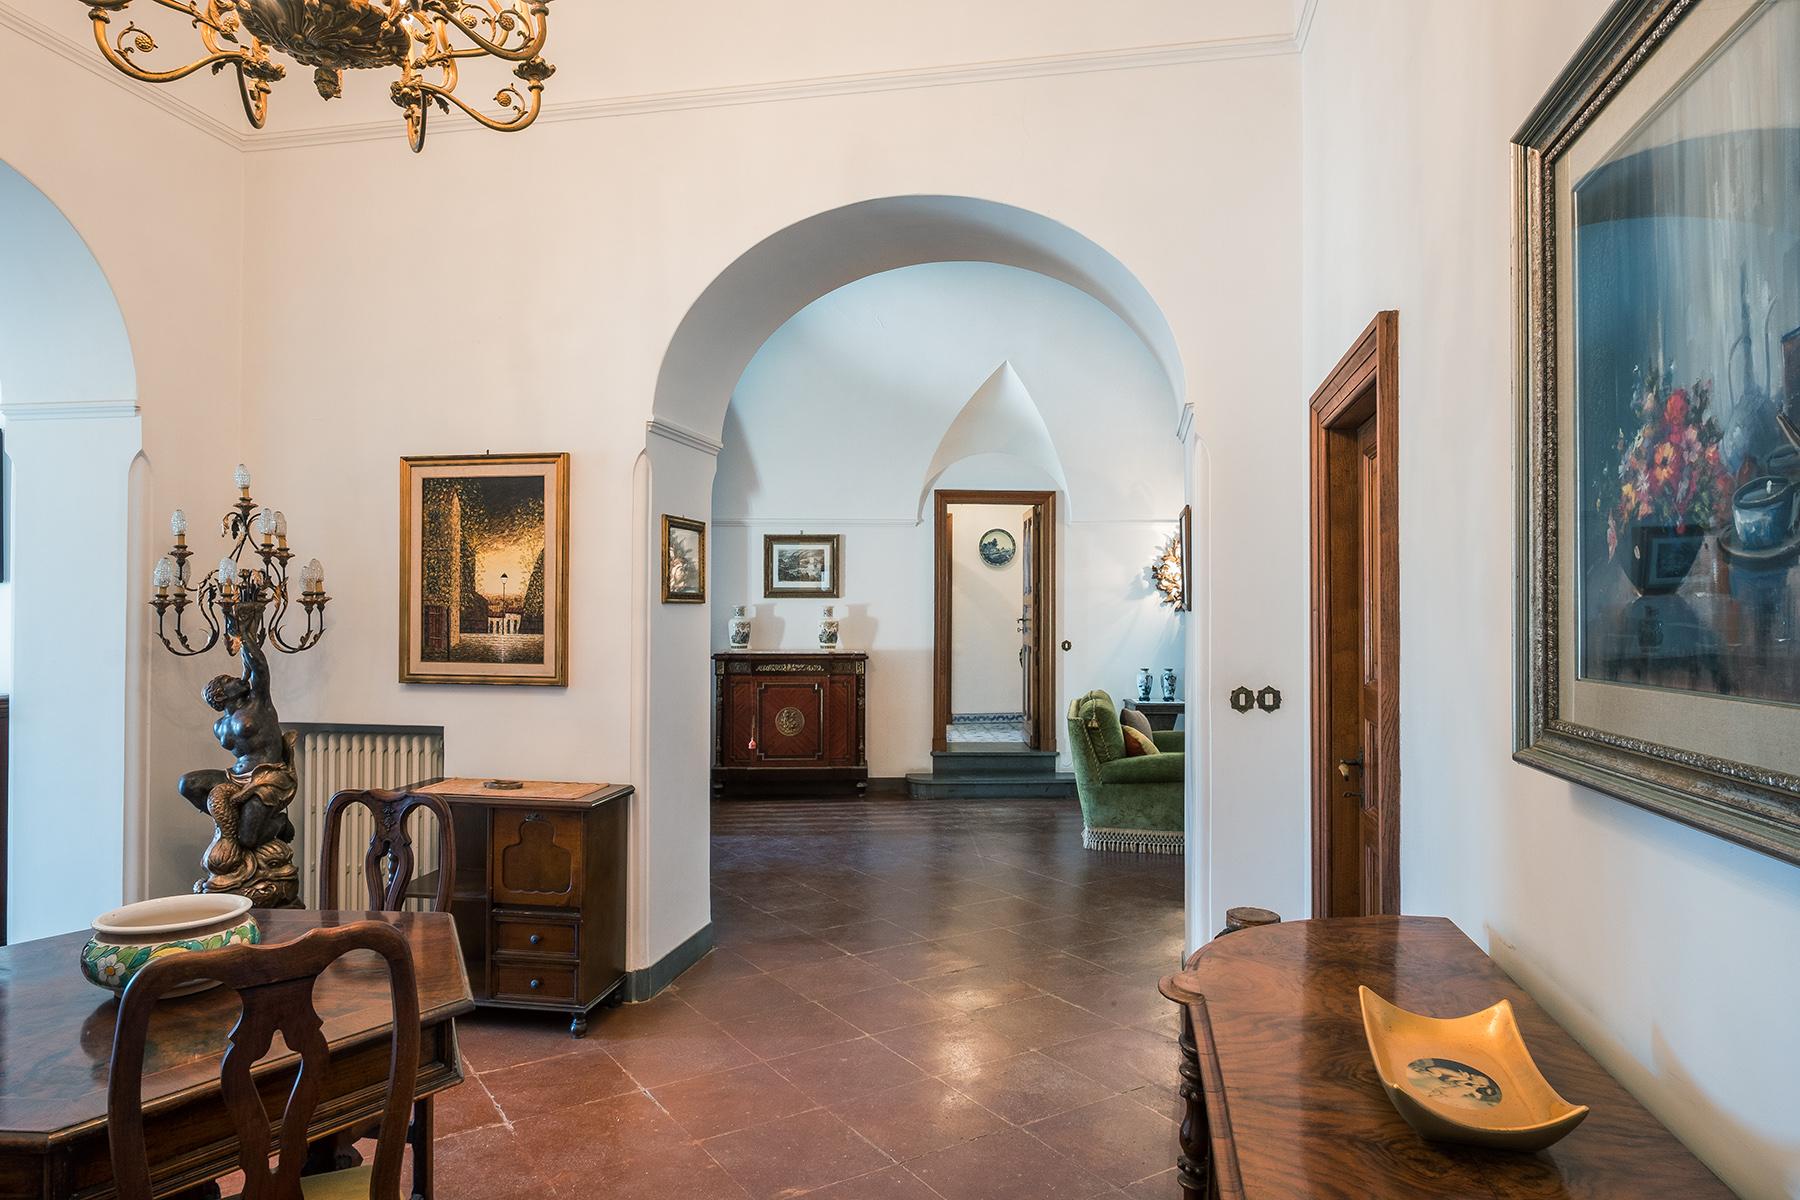 Casa indipendente in Vendita a Capri: 5 locali, 400 mq - Foto 10